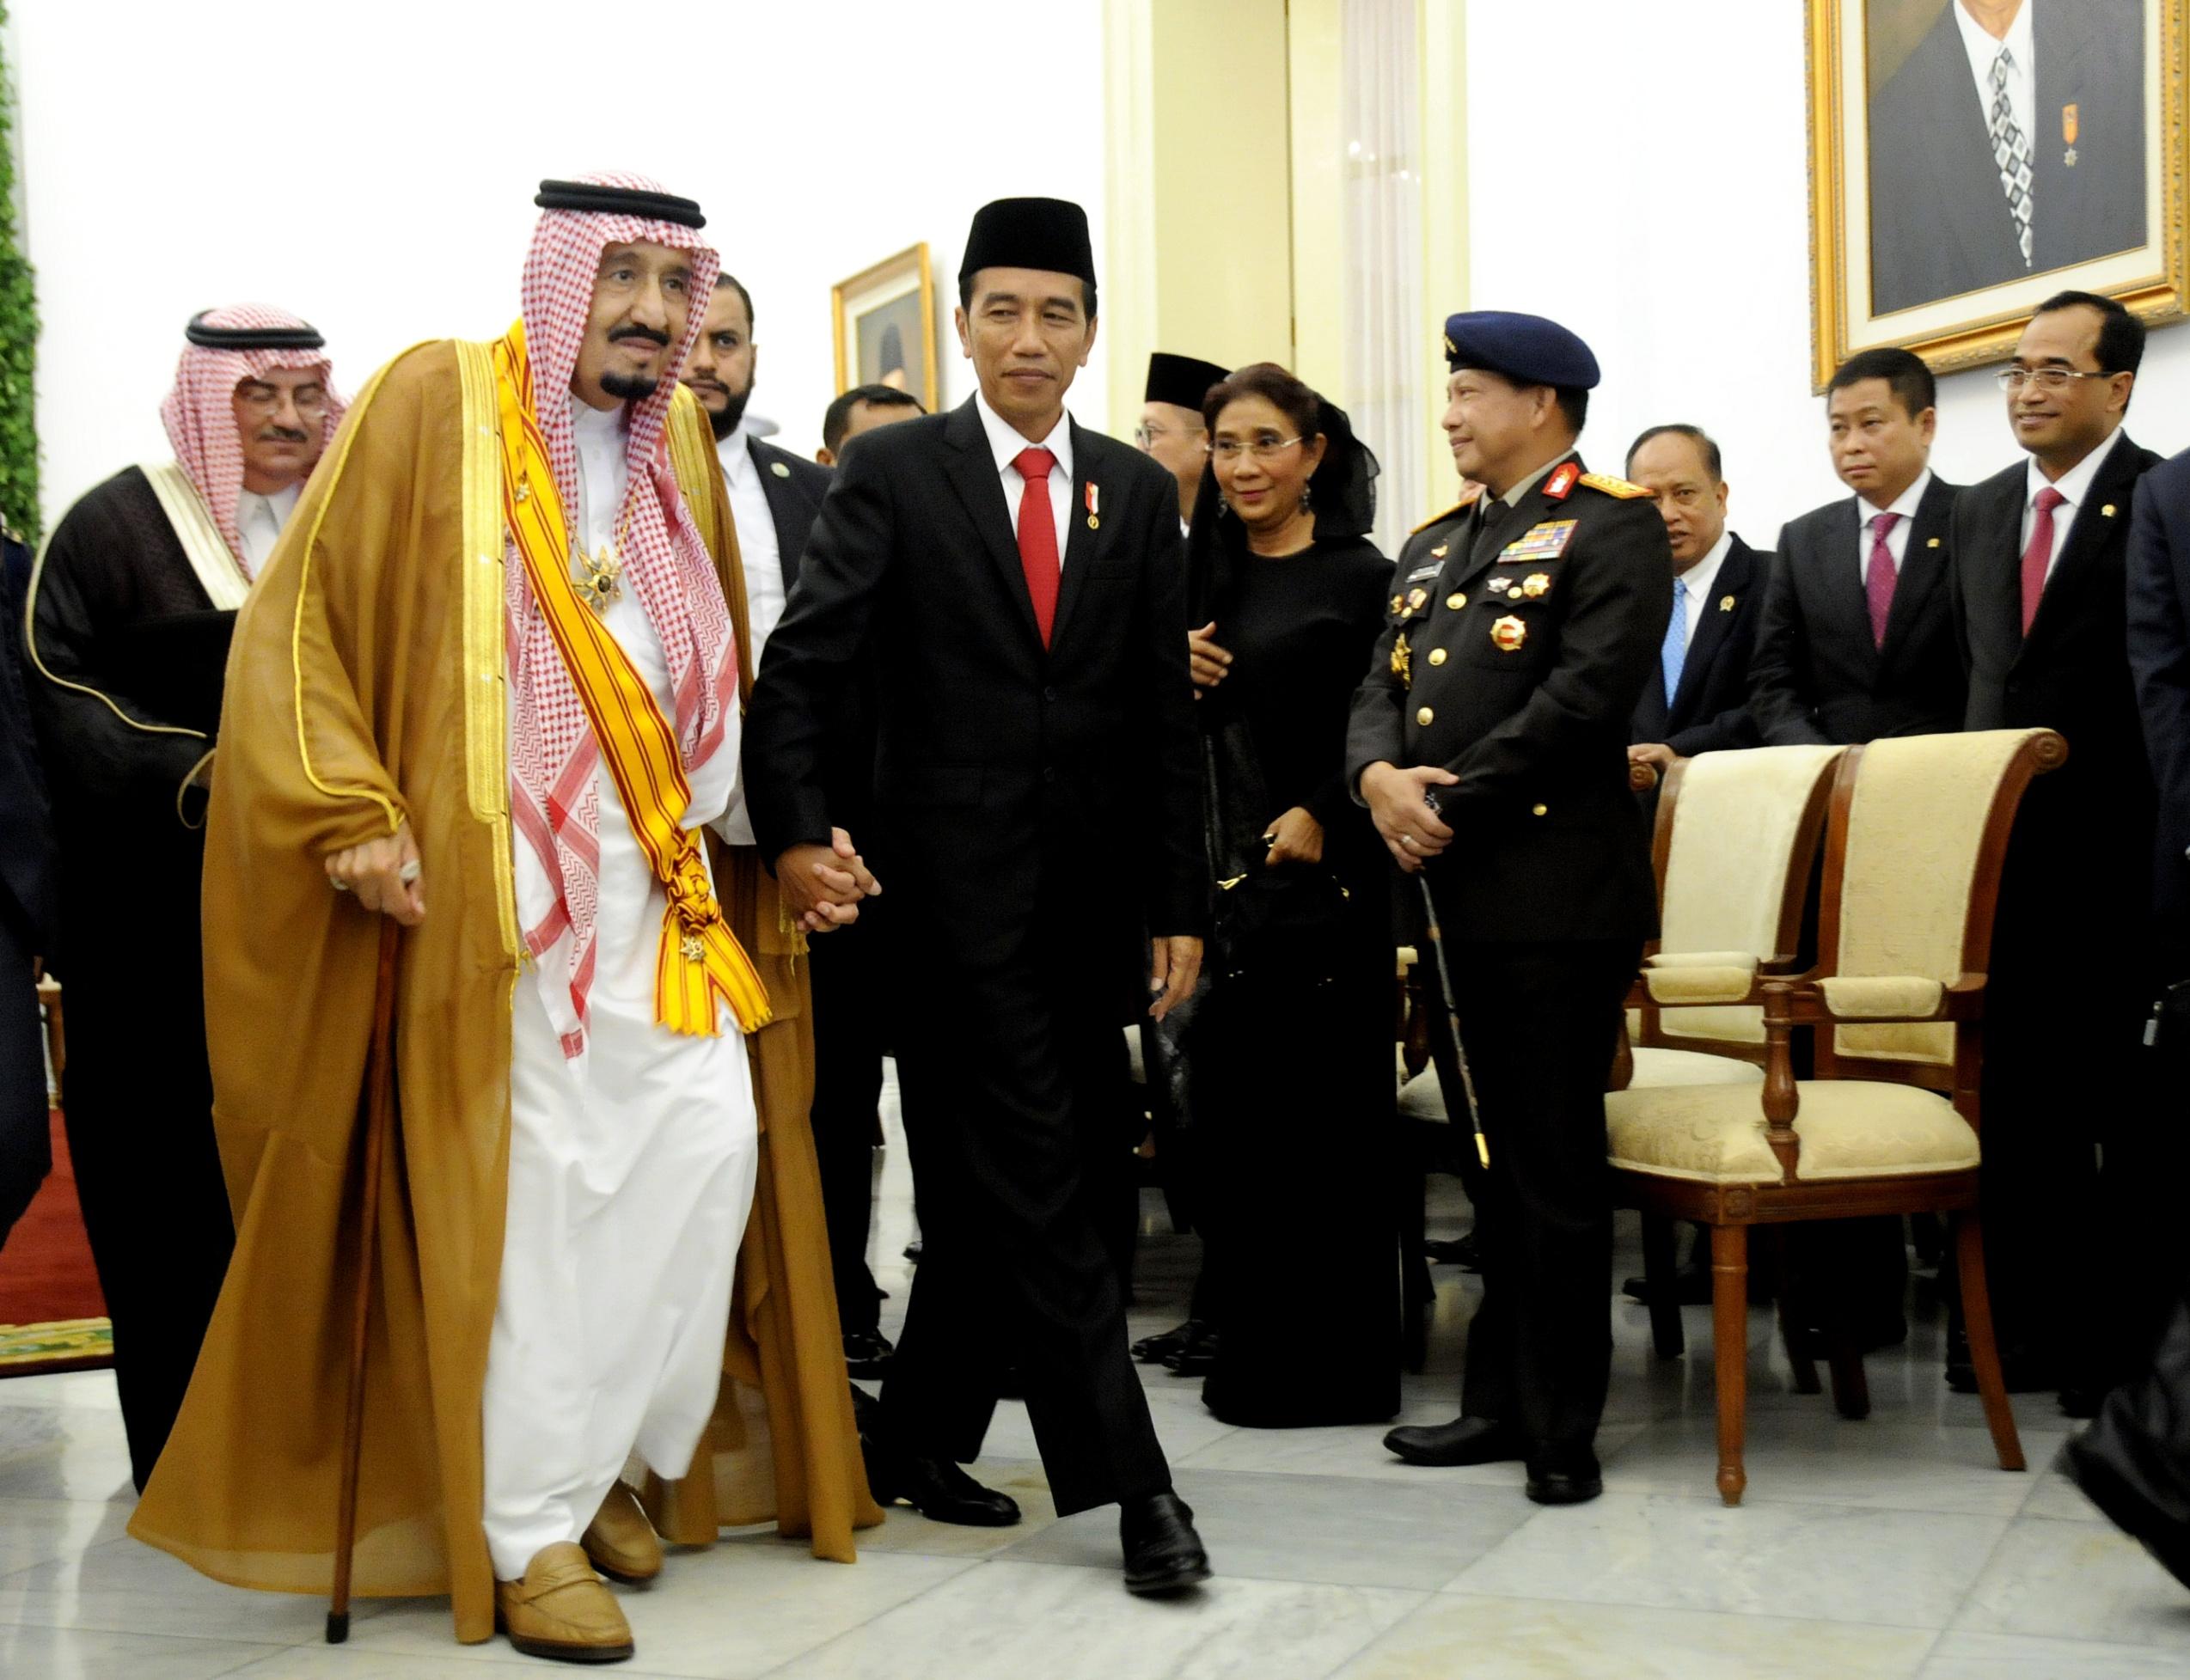 Presiden Jokowi bergandengan dengan Raja Salman dalam rangkaian kunjungan kenegaraan di Istana Kepresidenan Bogor, Jawa Barat, Rabu (1/3). (Foto: Humas/Agung)